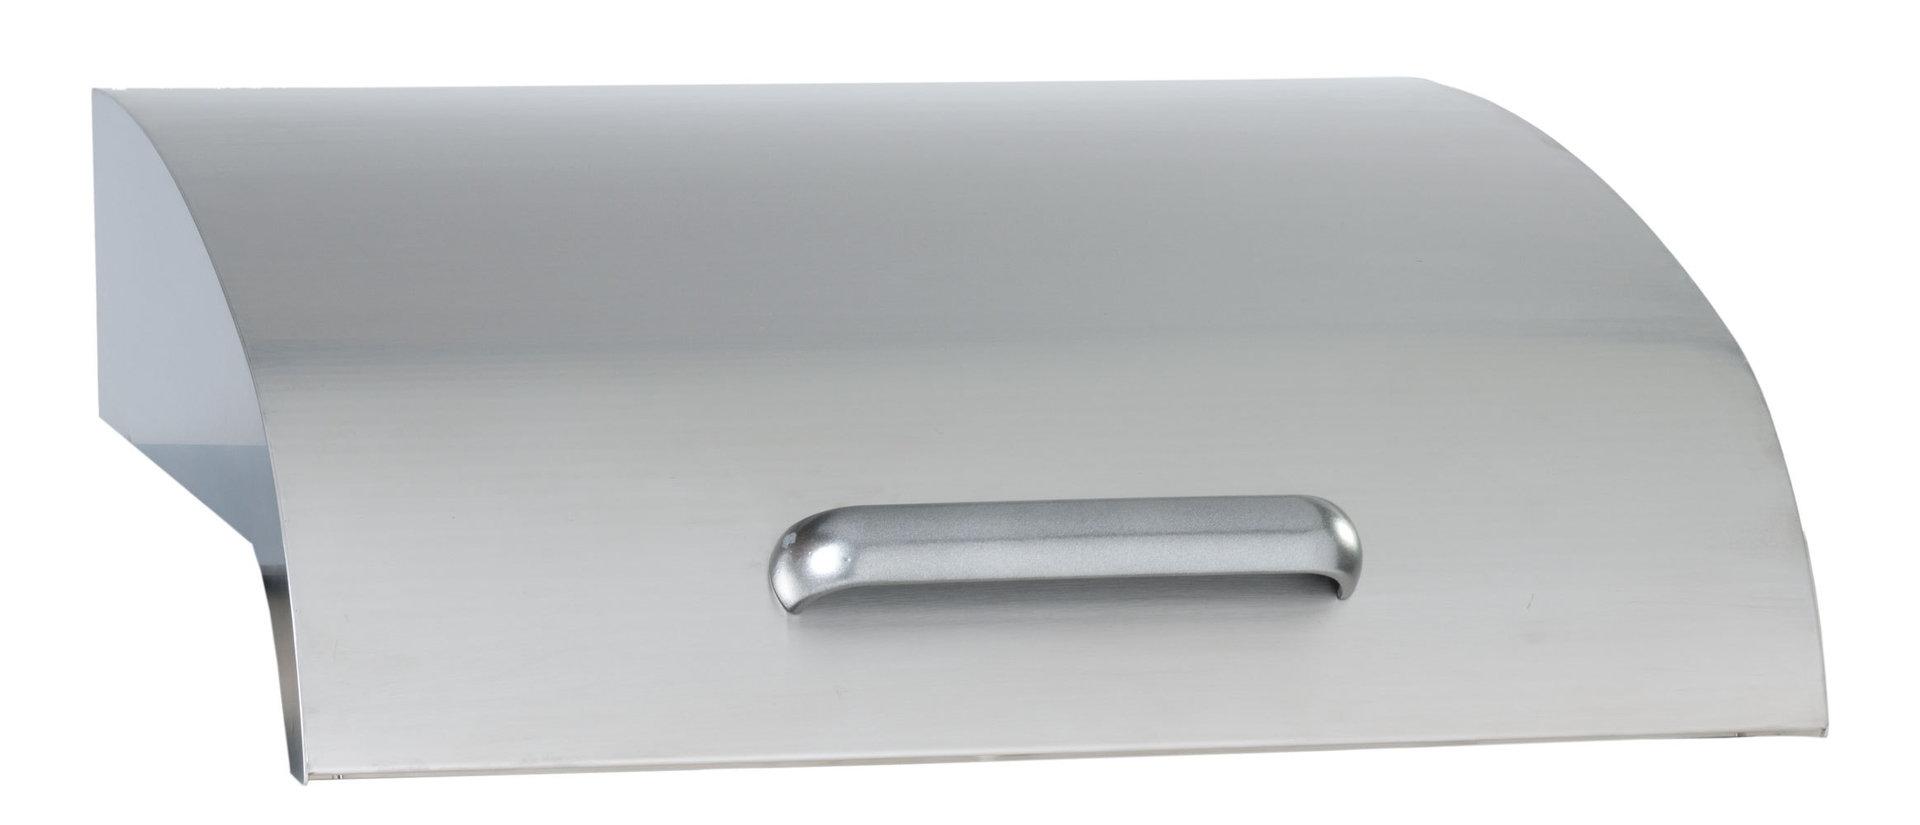 Tapa acero inoxidable para planchas innova 800 la mejor - Plancha acero inoxidable precio ...